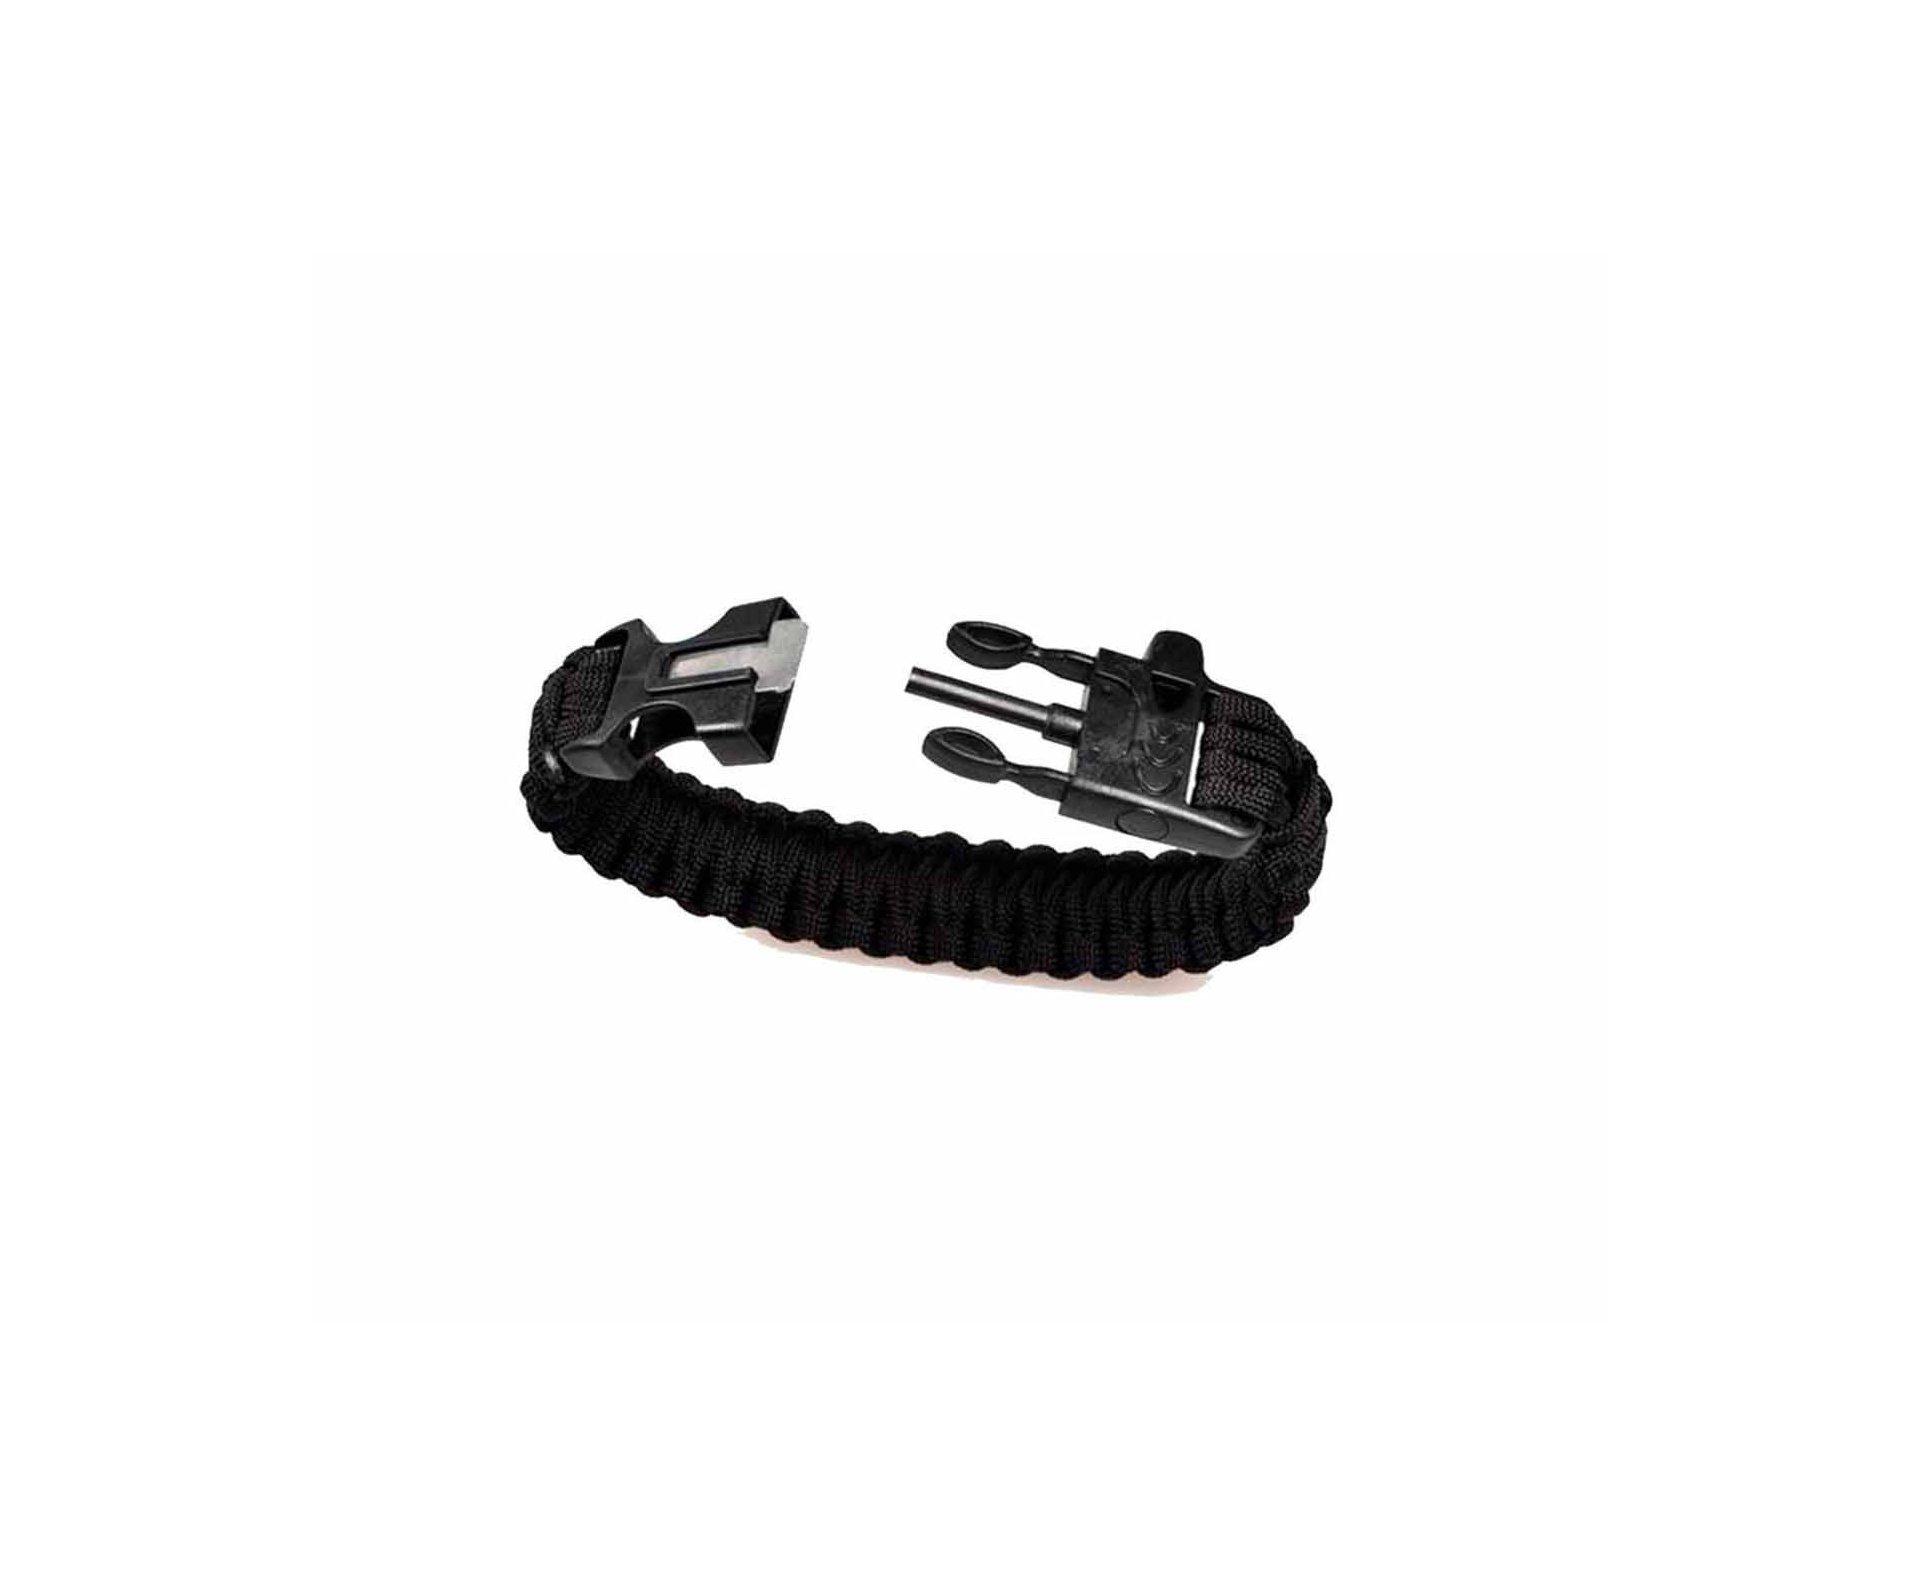 Bracelete Survivor C/ Apito E Pederneira 4-preto - Treme Terra